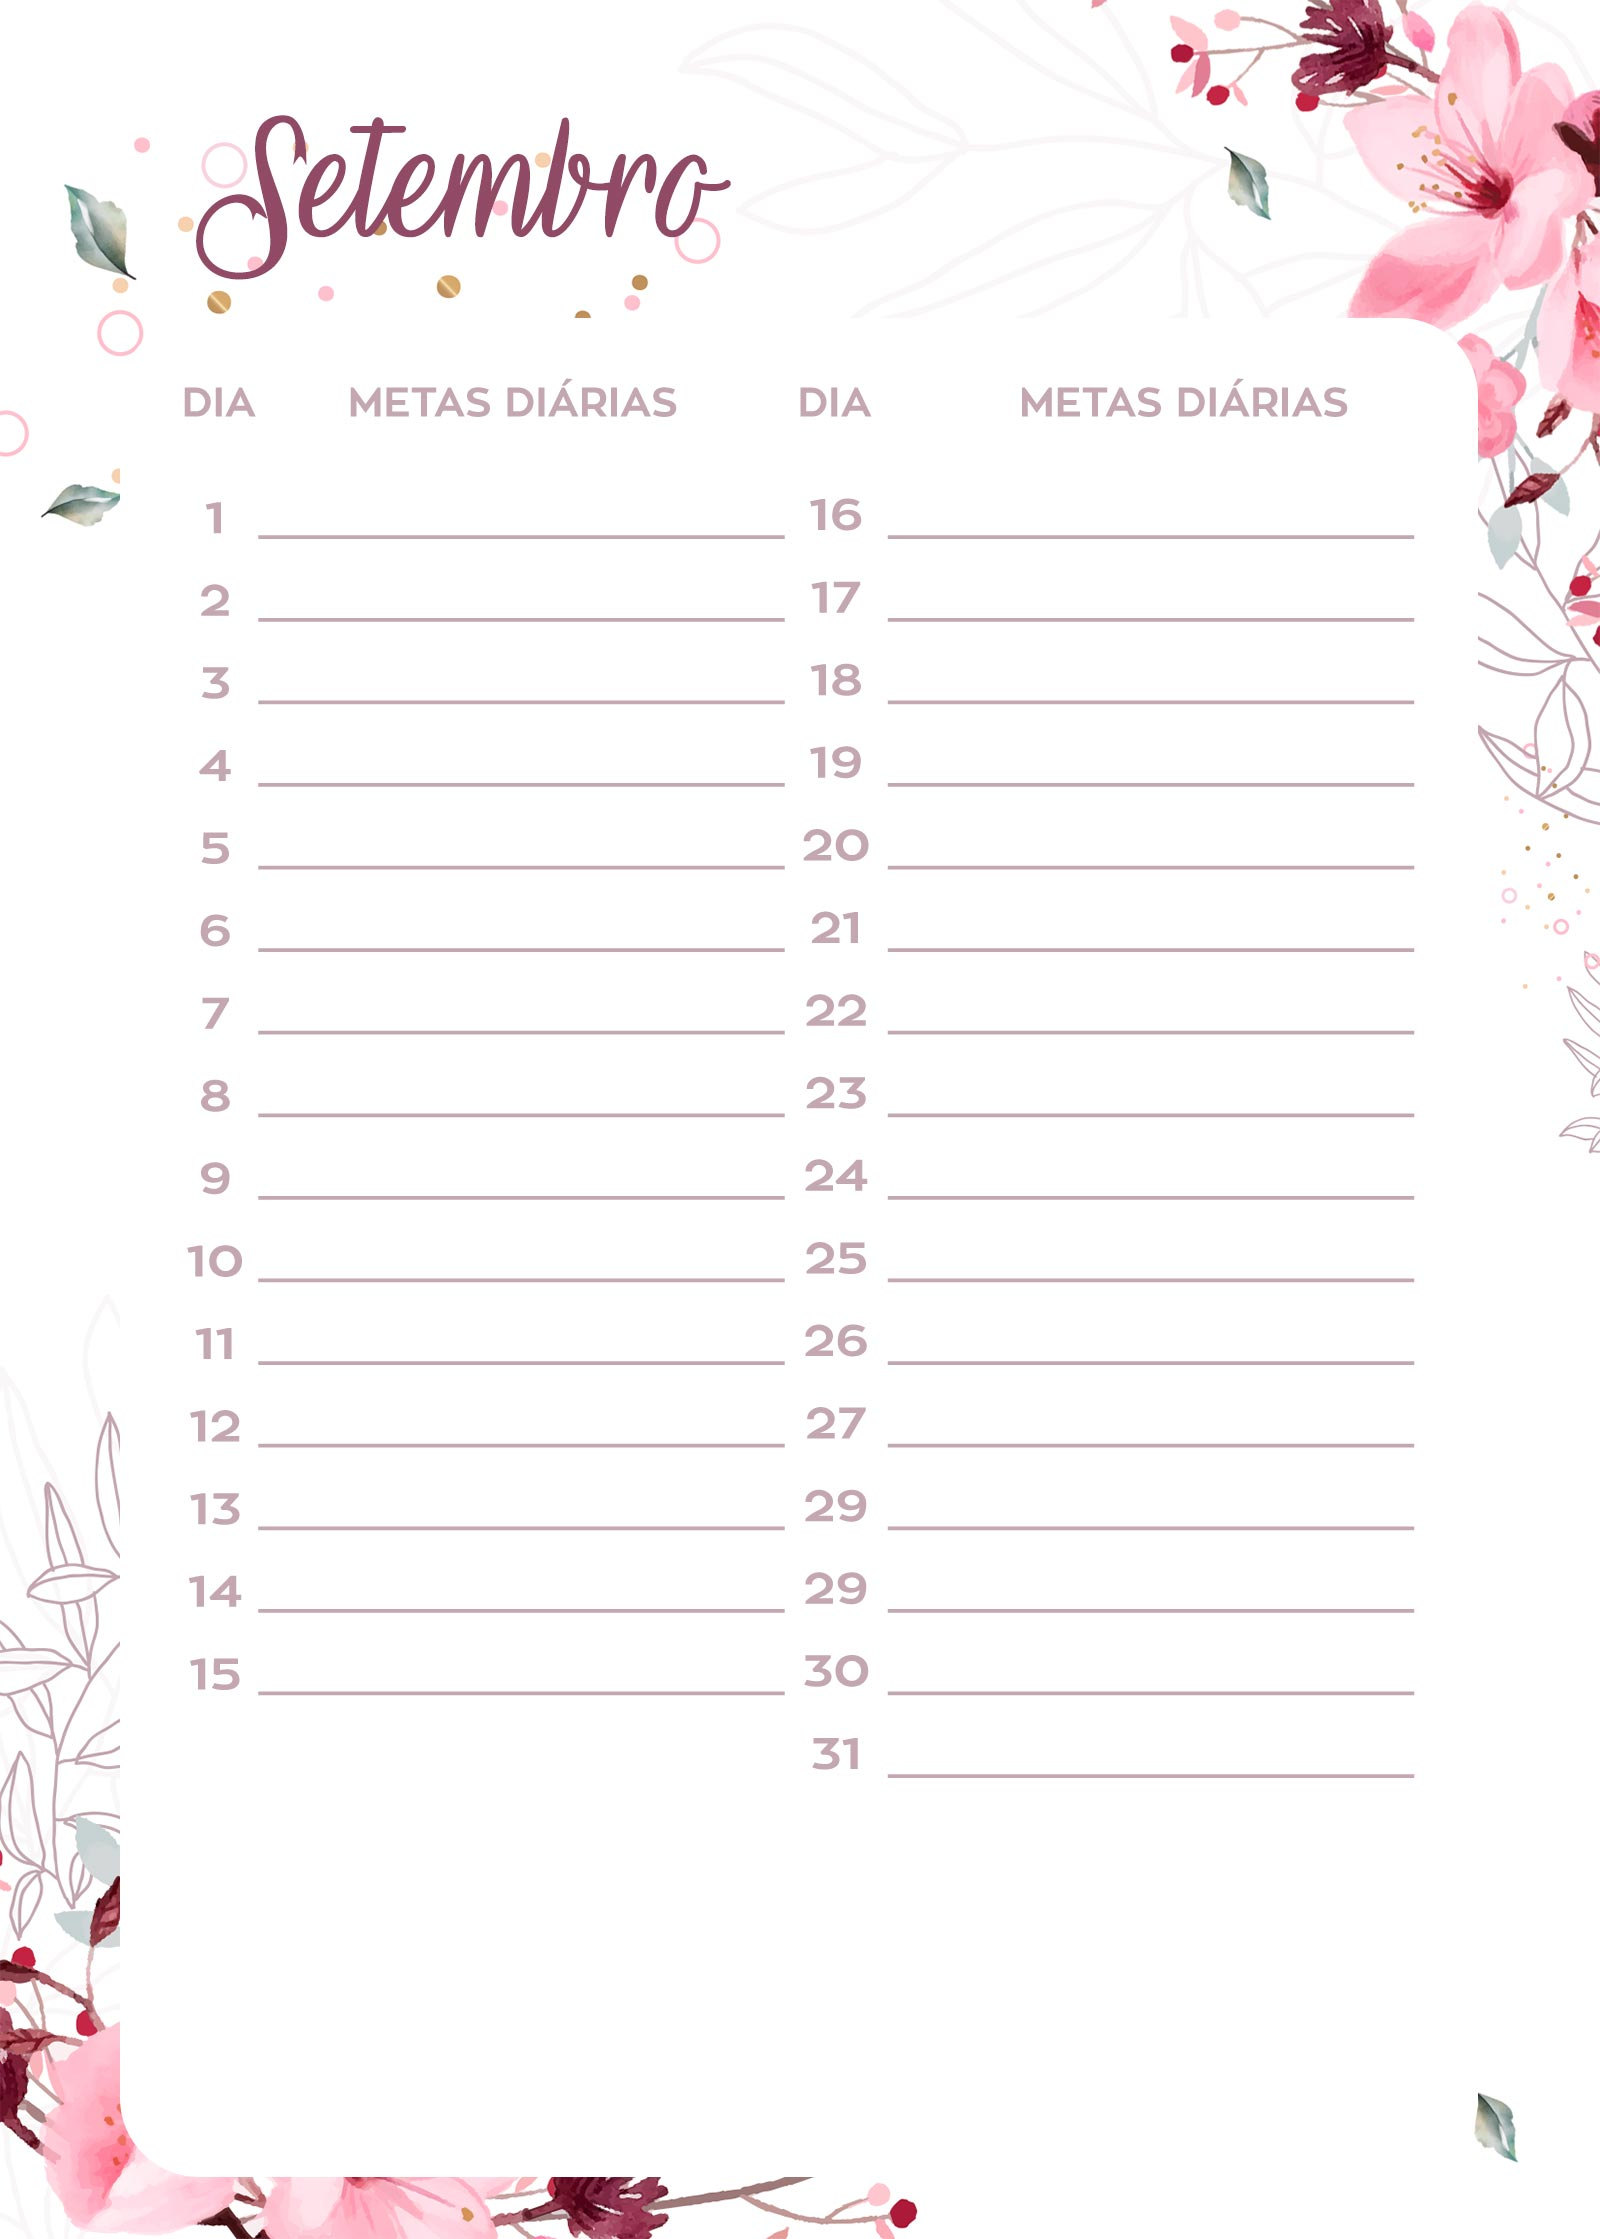 Planner Floral metas diarias set